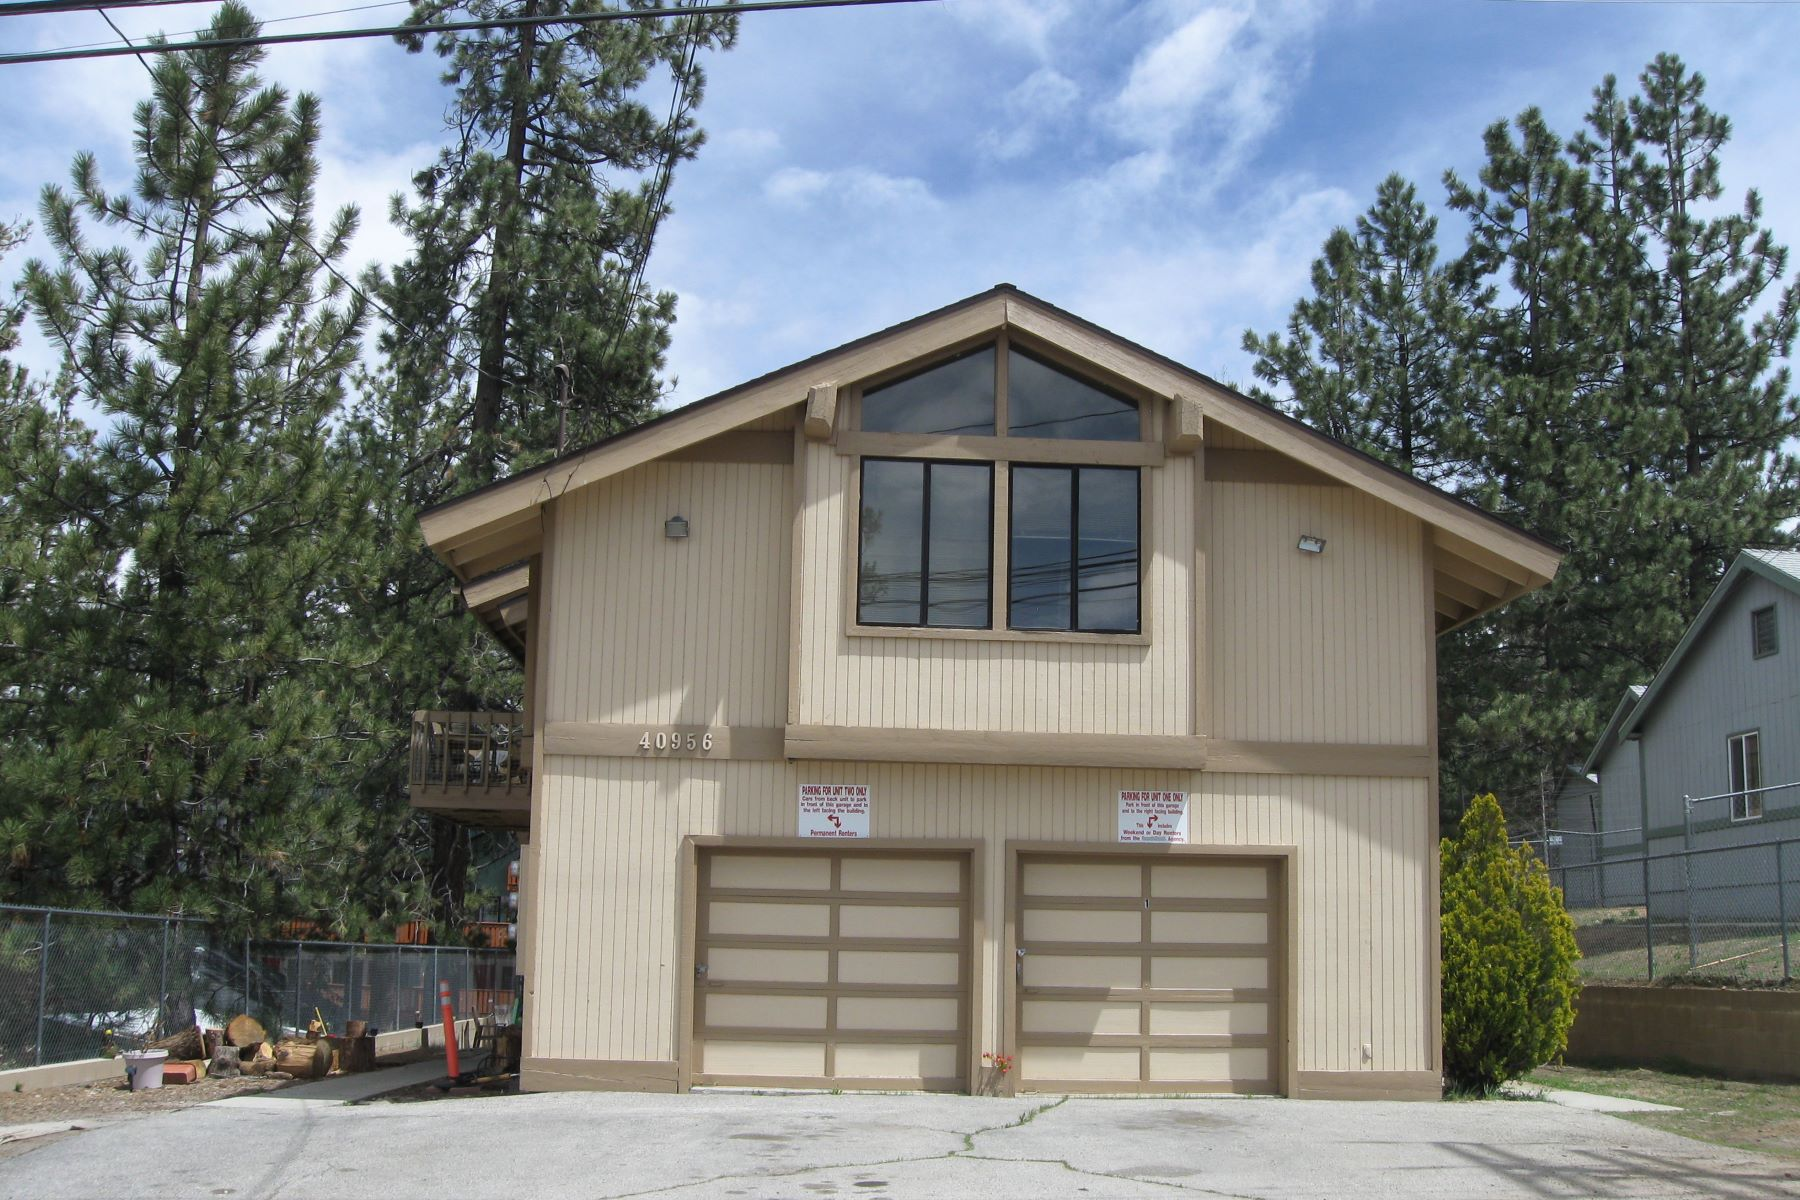 Multi-Family Home for Sale at Big Bear 40956 Pennsylvania Big Bear Lake, California, 92315 United States